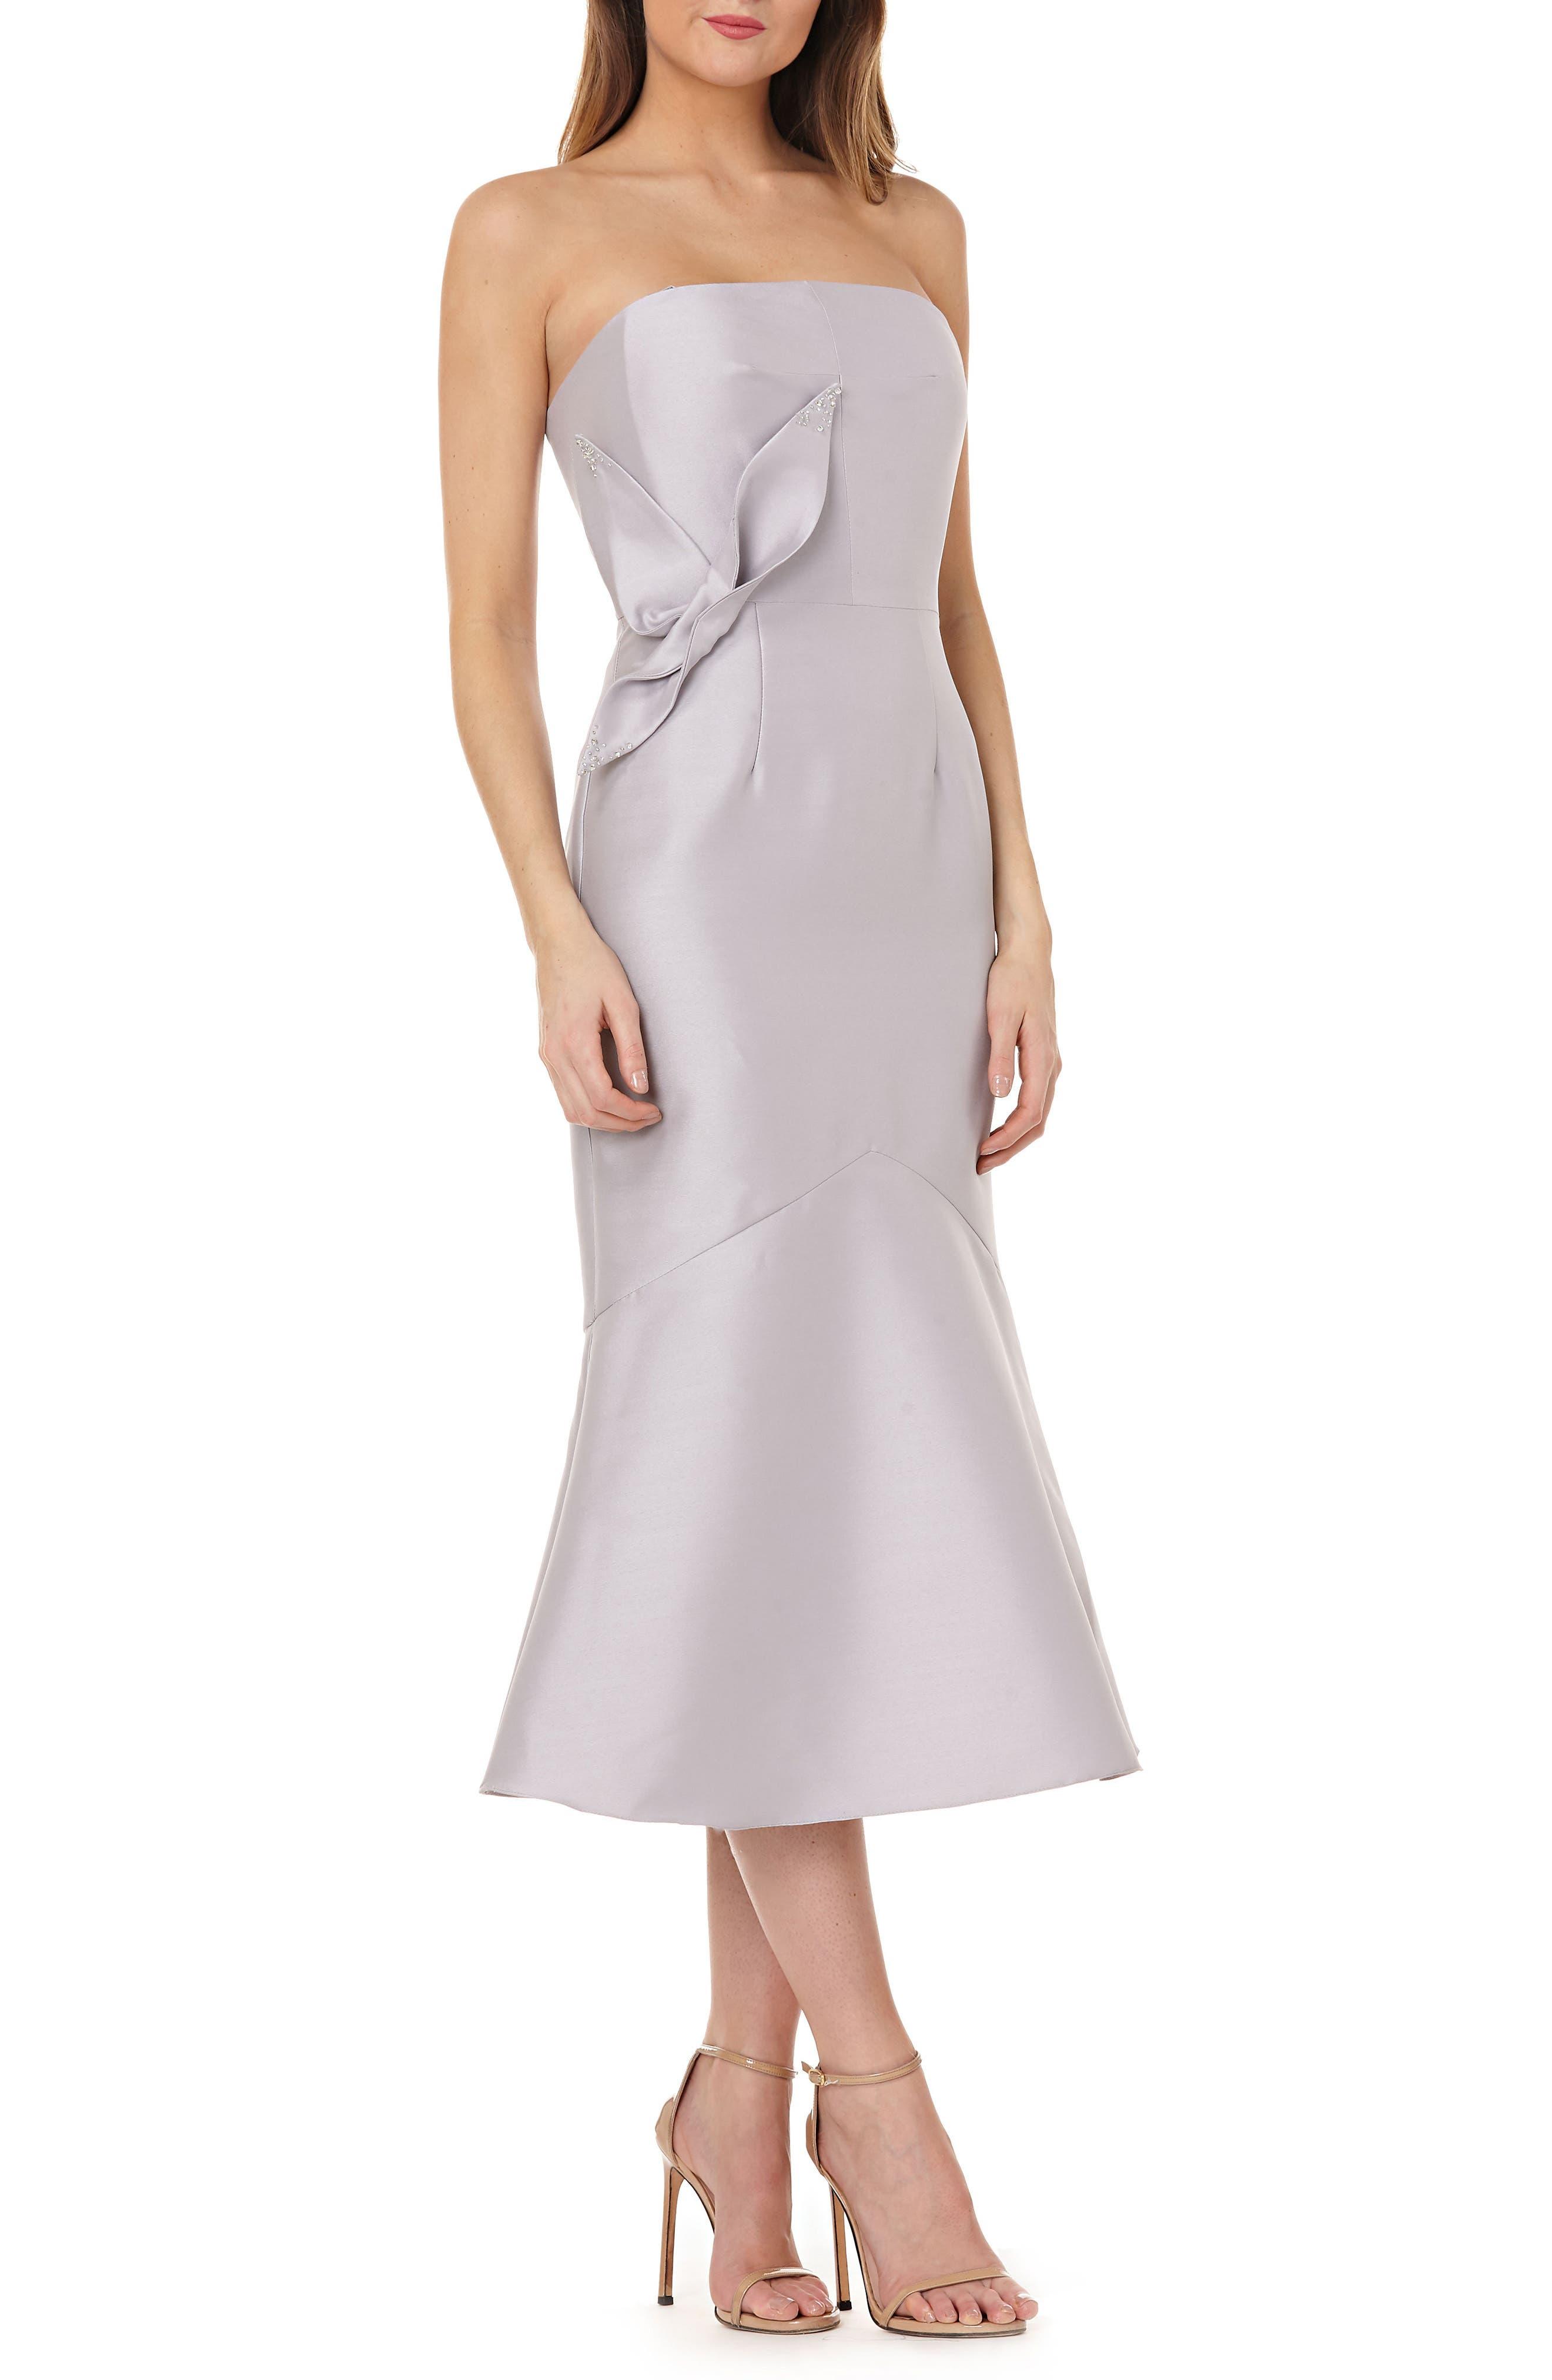 Kay Unger Strapless Satin Tea Length Dress, Grey